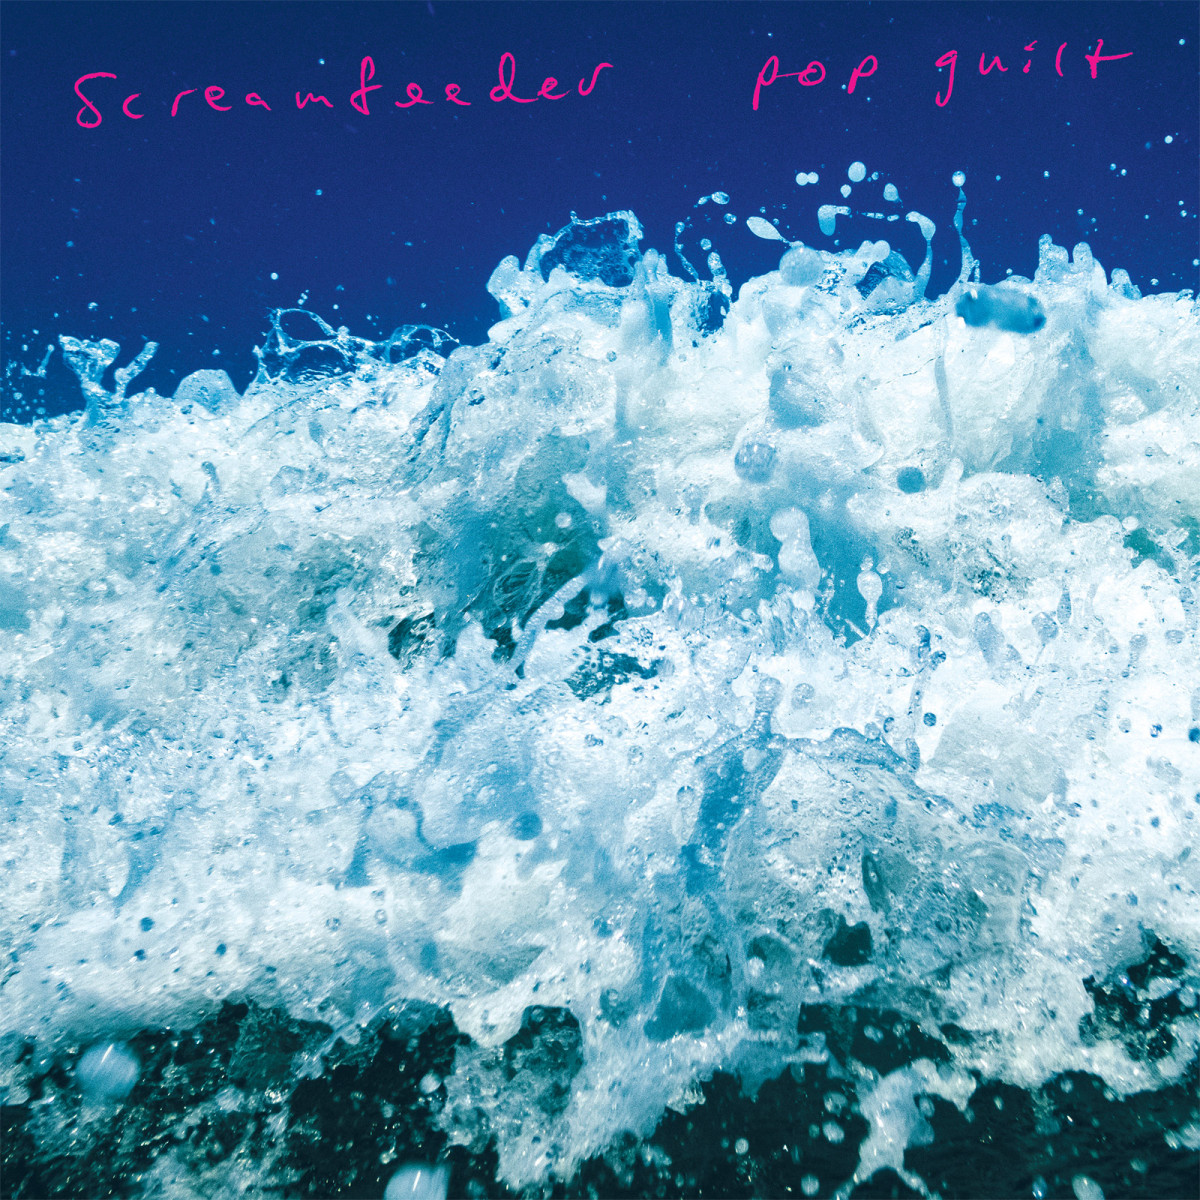 Screamfeeder-Pop-Guilt-Web-Large